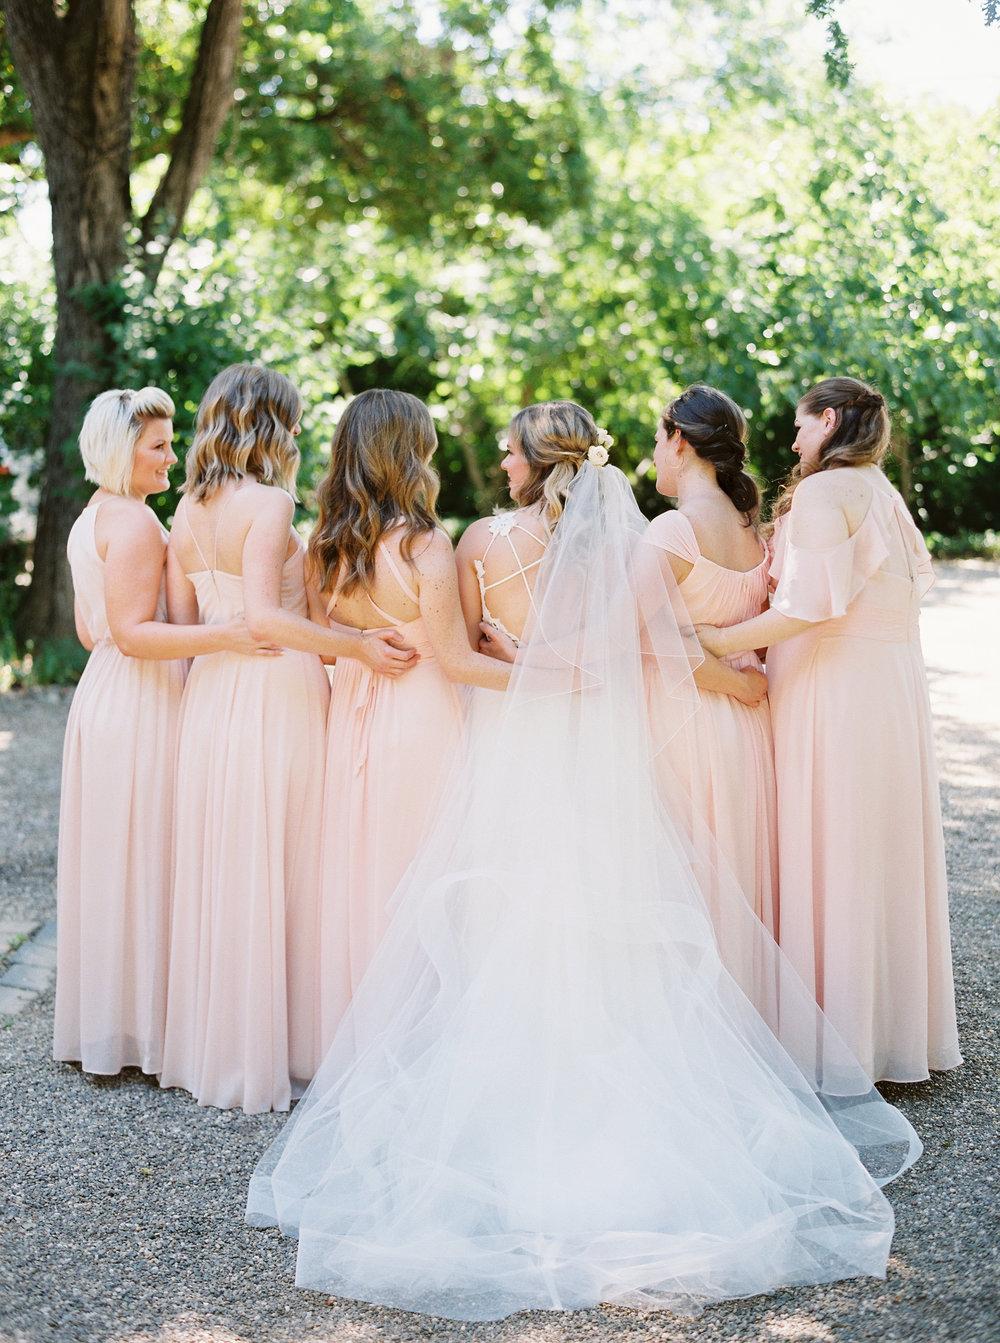 Durst-winery-wedding-in-lodi-calfornia-137.jpg